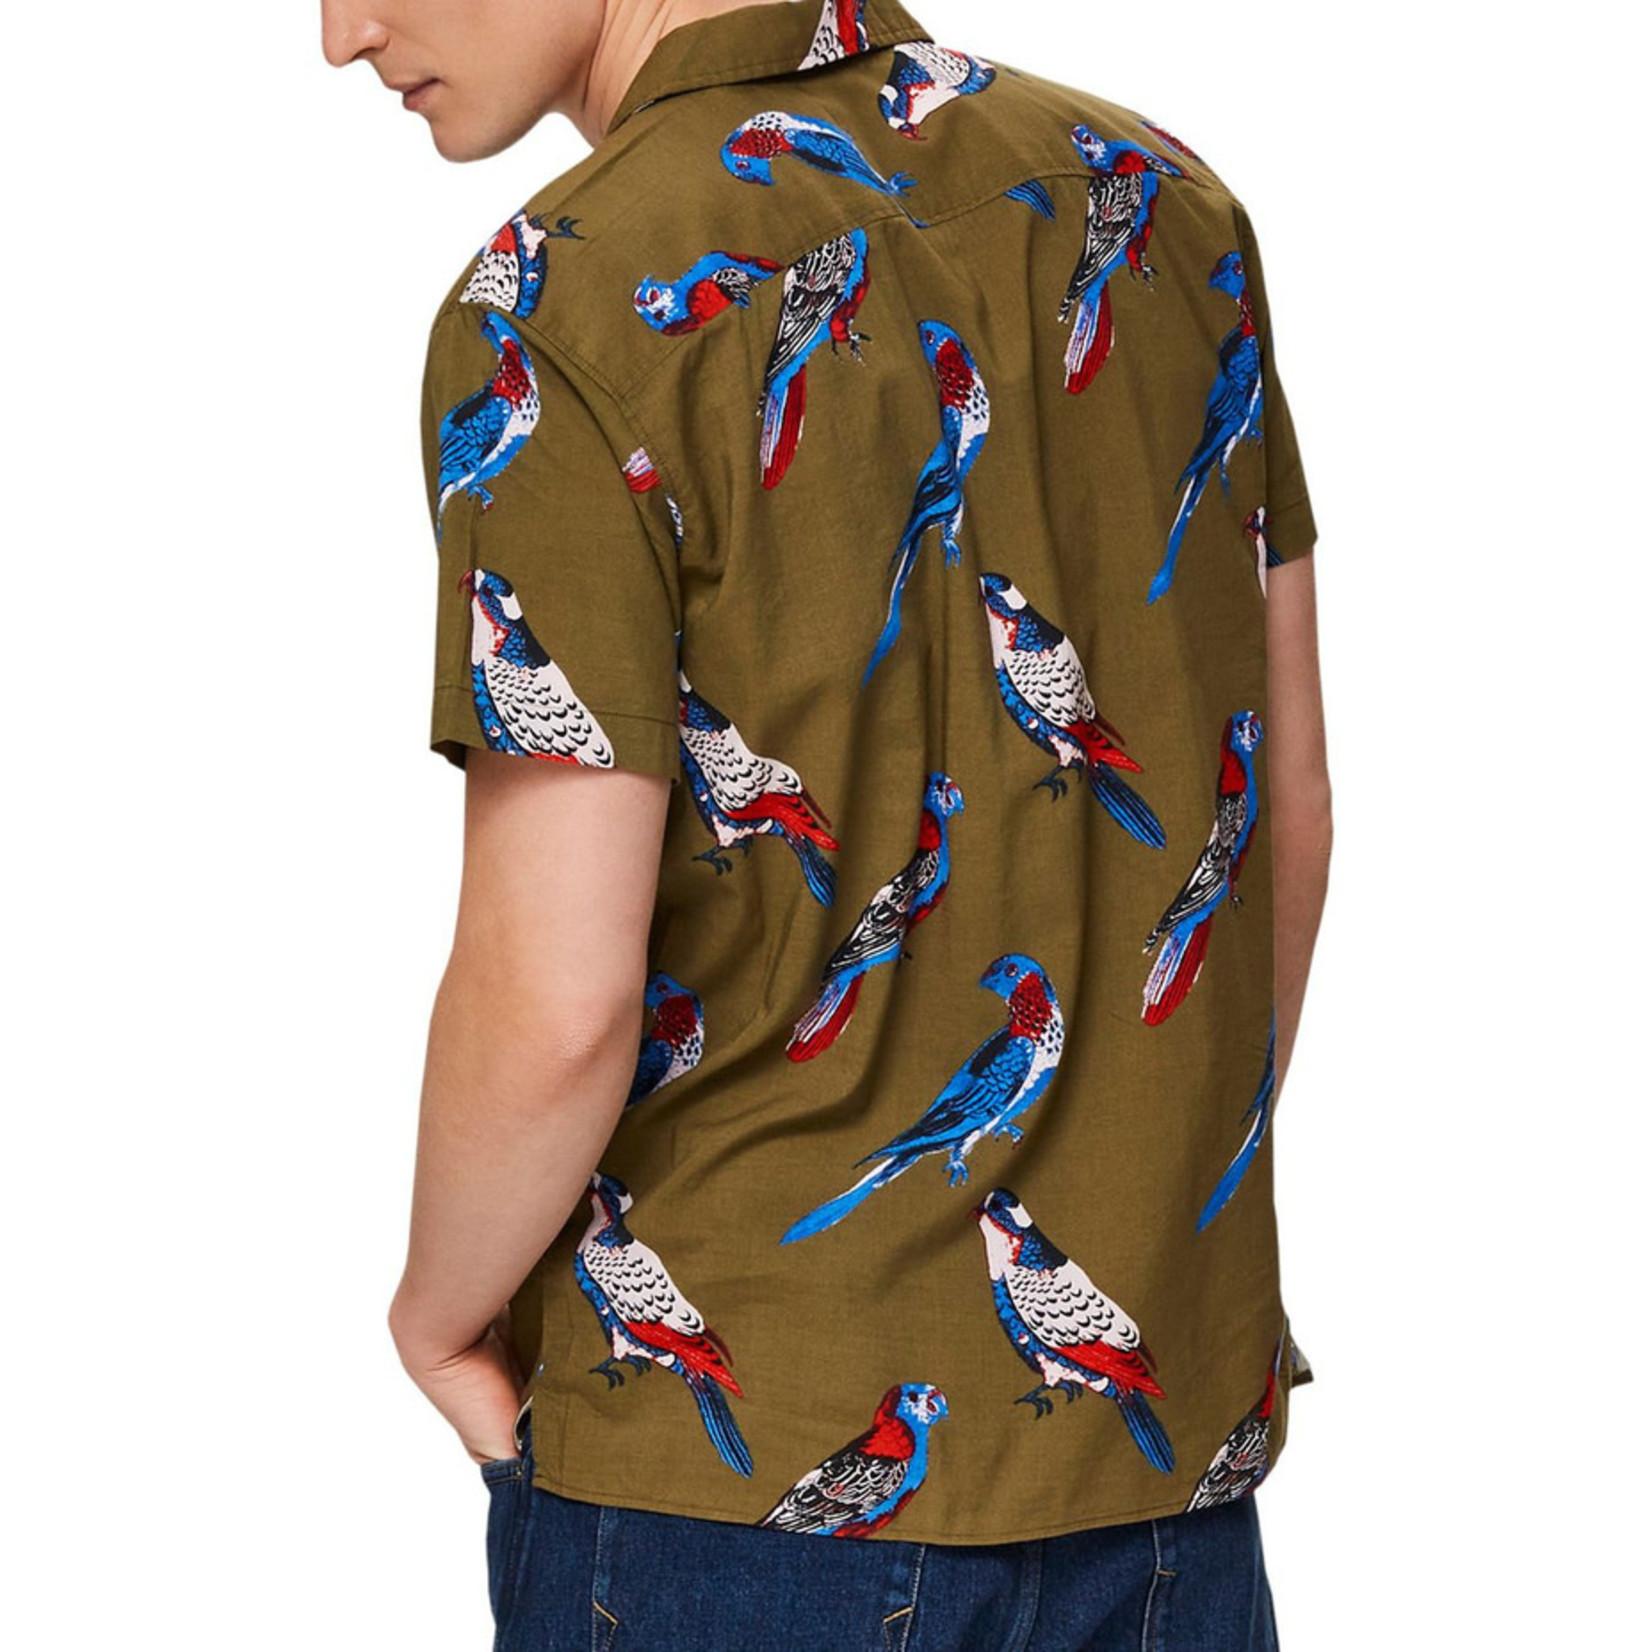 Selected Homme Selected Homme 16073543 Siesta Short-Sleeve Shirt - Dark Olive Print